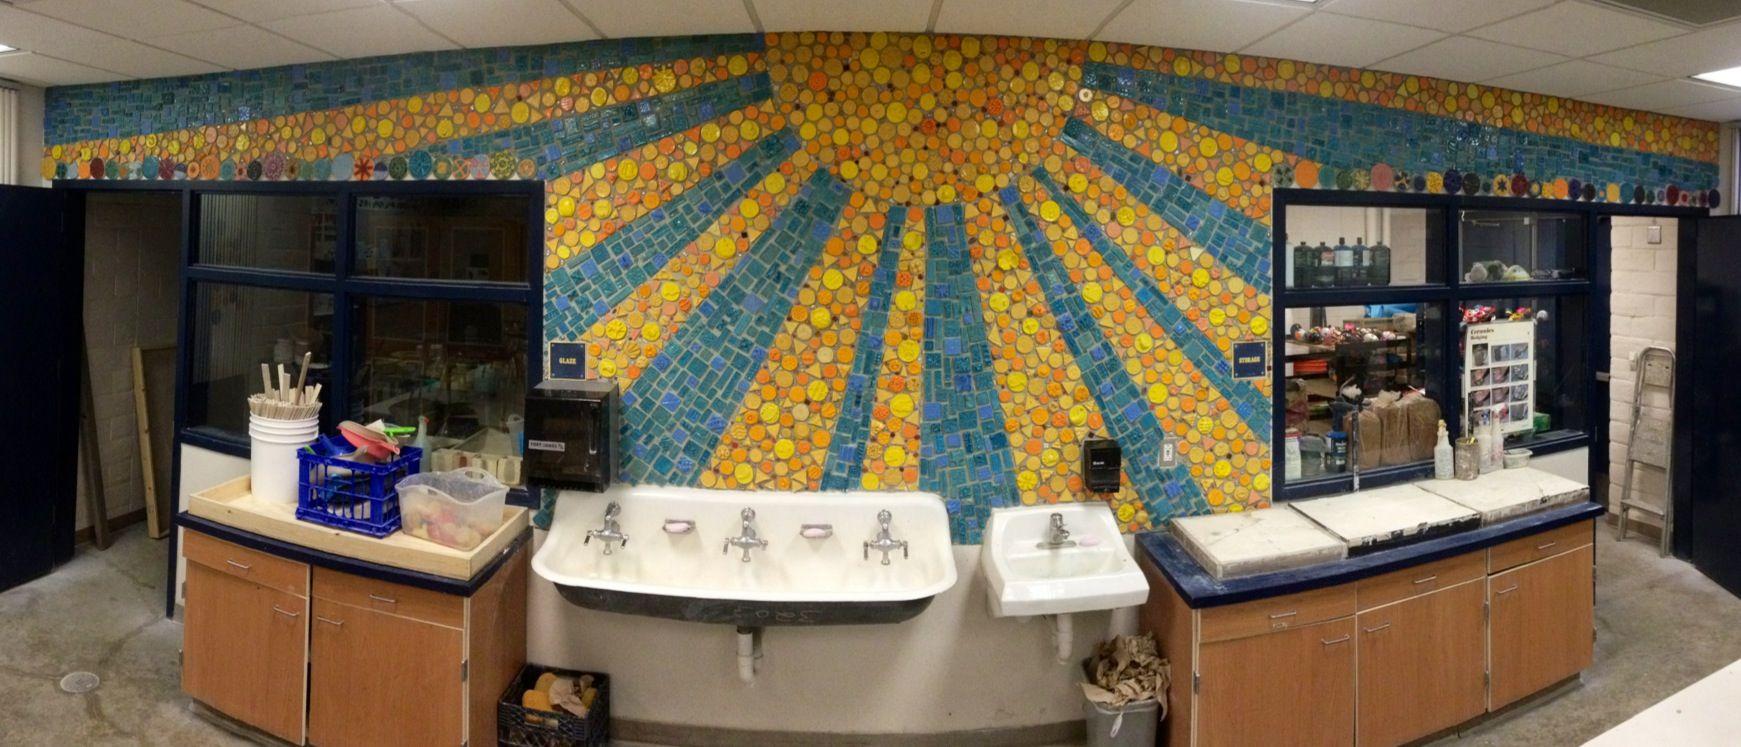 In Progress Mosaic Mural Ceramics Classroom At Sunnyside High School Fresno Ca